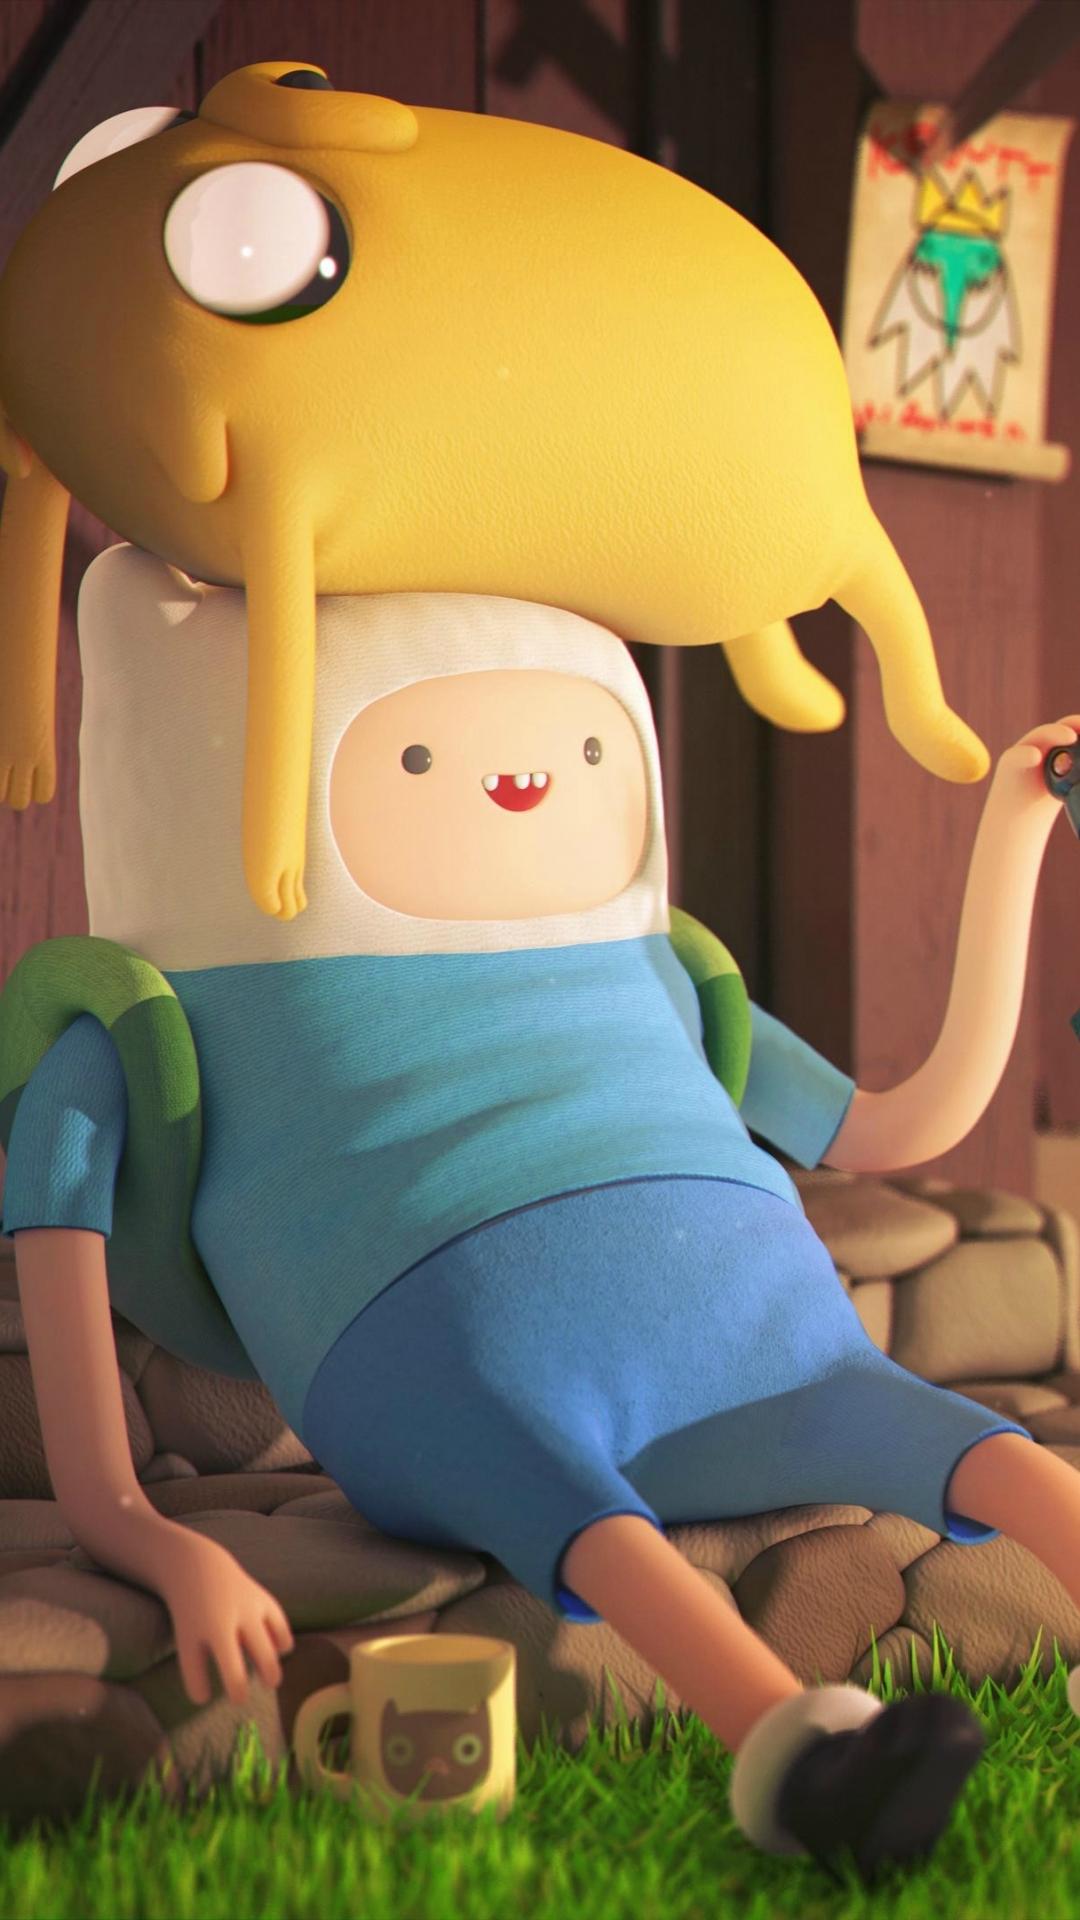 Adventure Time Jake Iphone Wallpaper Adventure Time Iphone Wallpapers Hd Pixelstalk Net